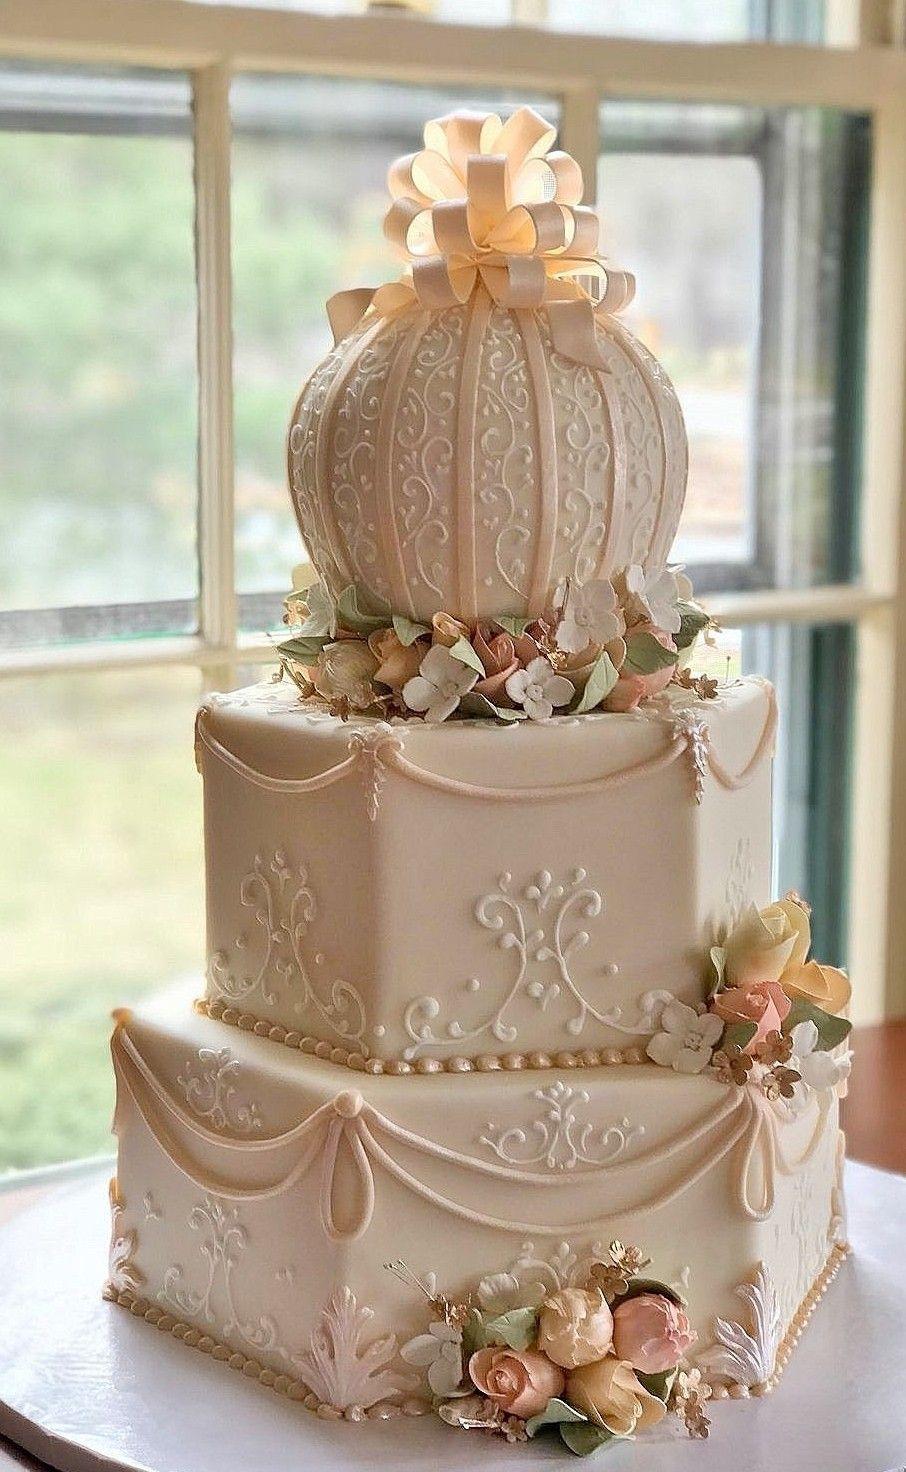 Classic Vintage Elegance With Images Wedding Cake Designs